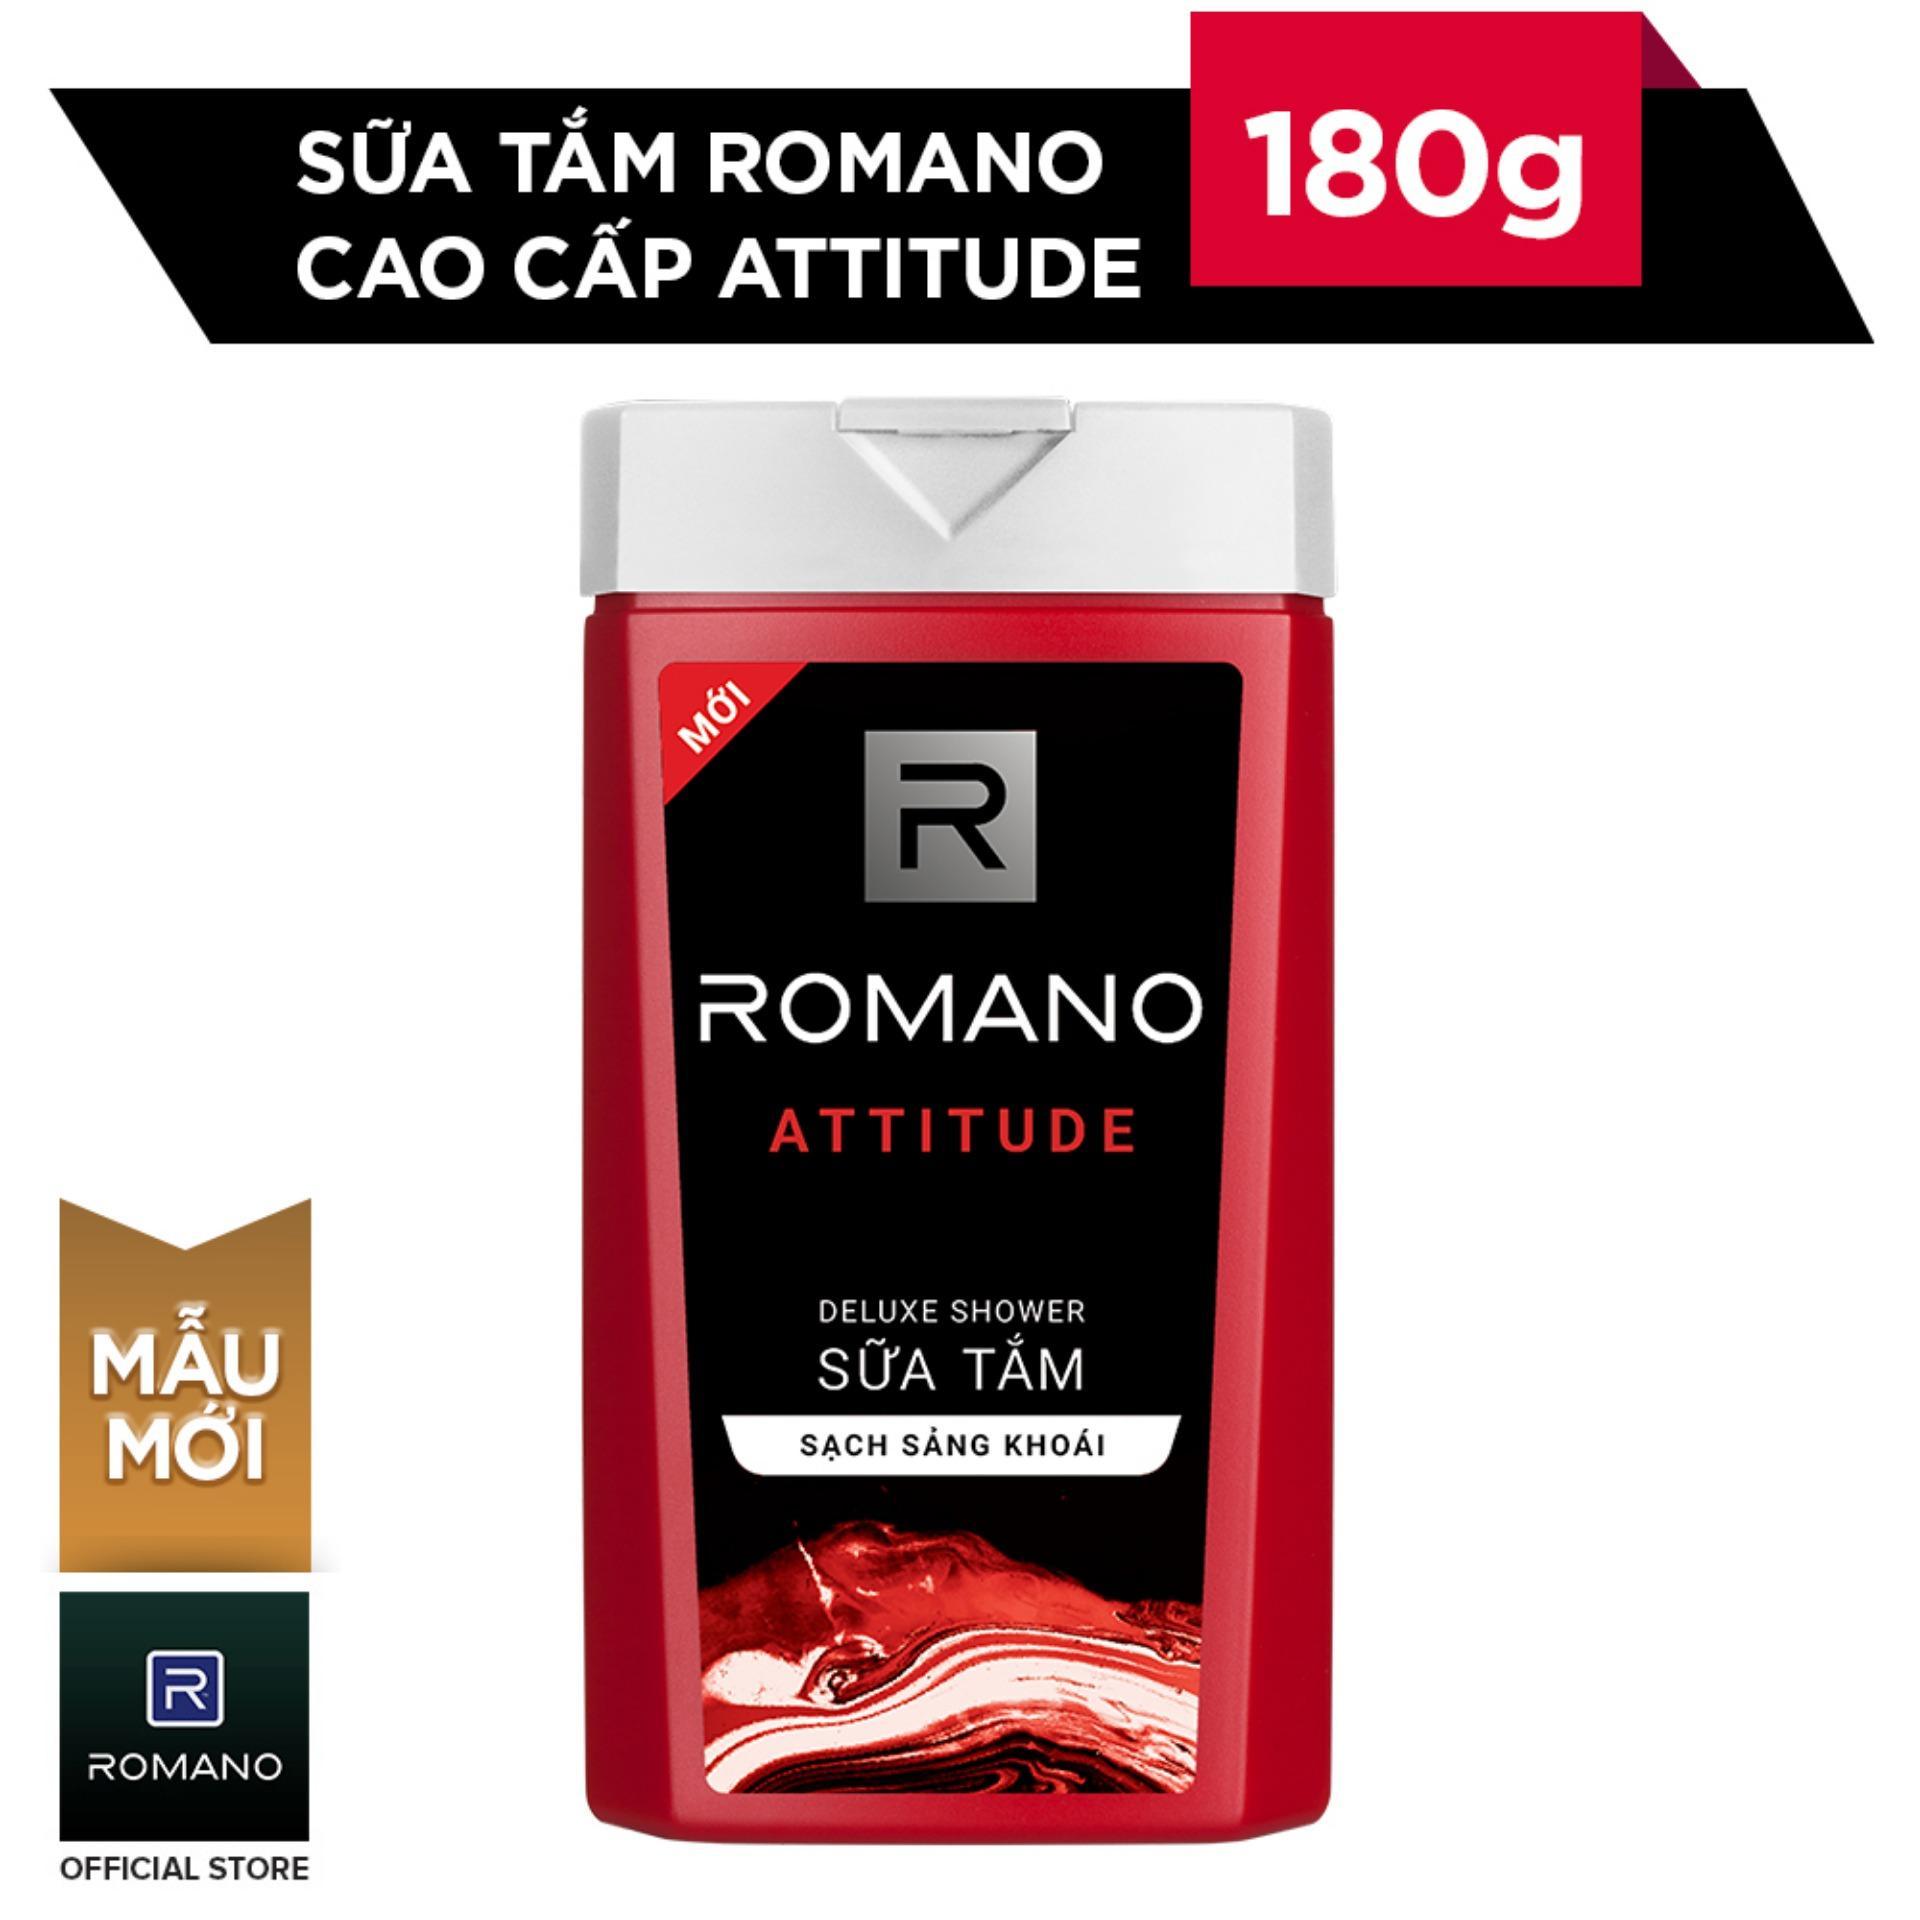 Romano sữa tắm cao cấp attitude 180g nhập khẩu